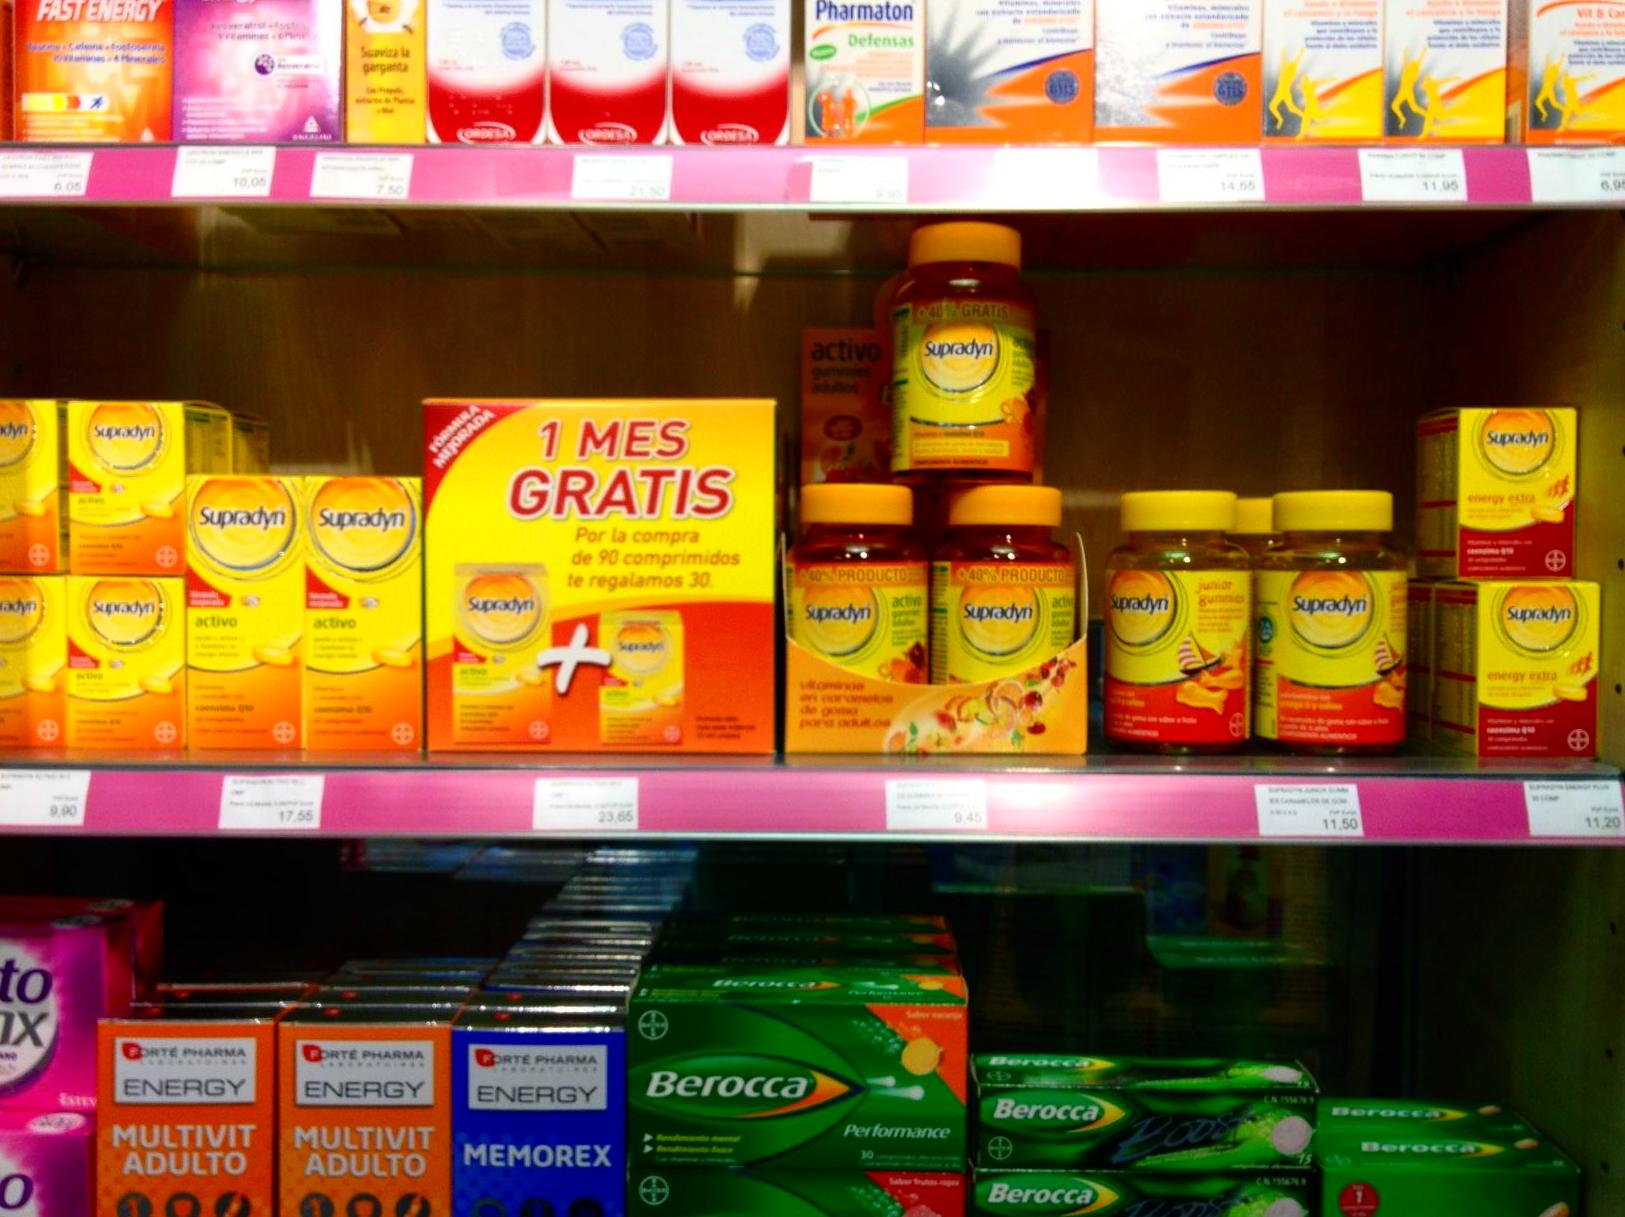 Foto 16 de Farmacias en Terrassa | Farmacia-Ortopedia Can Parellada